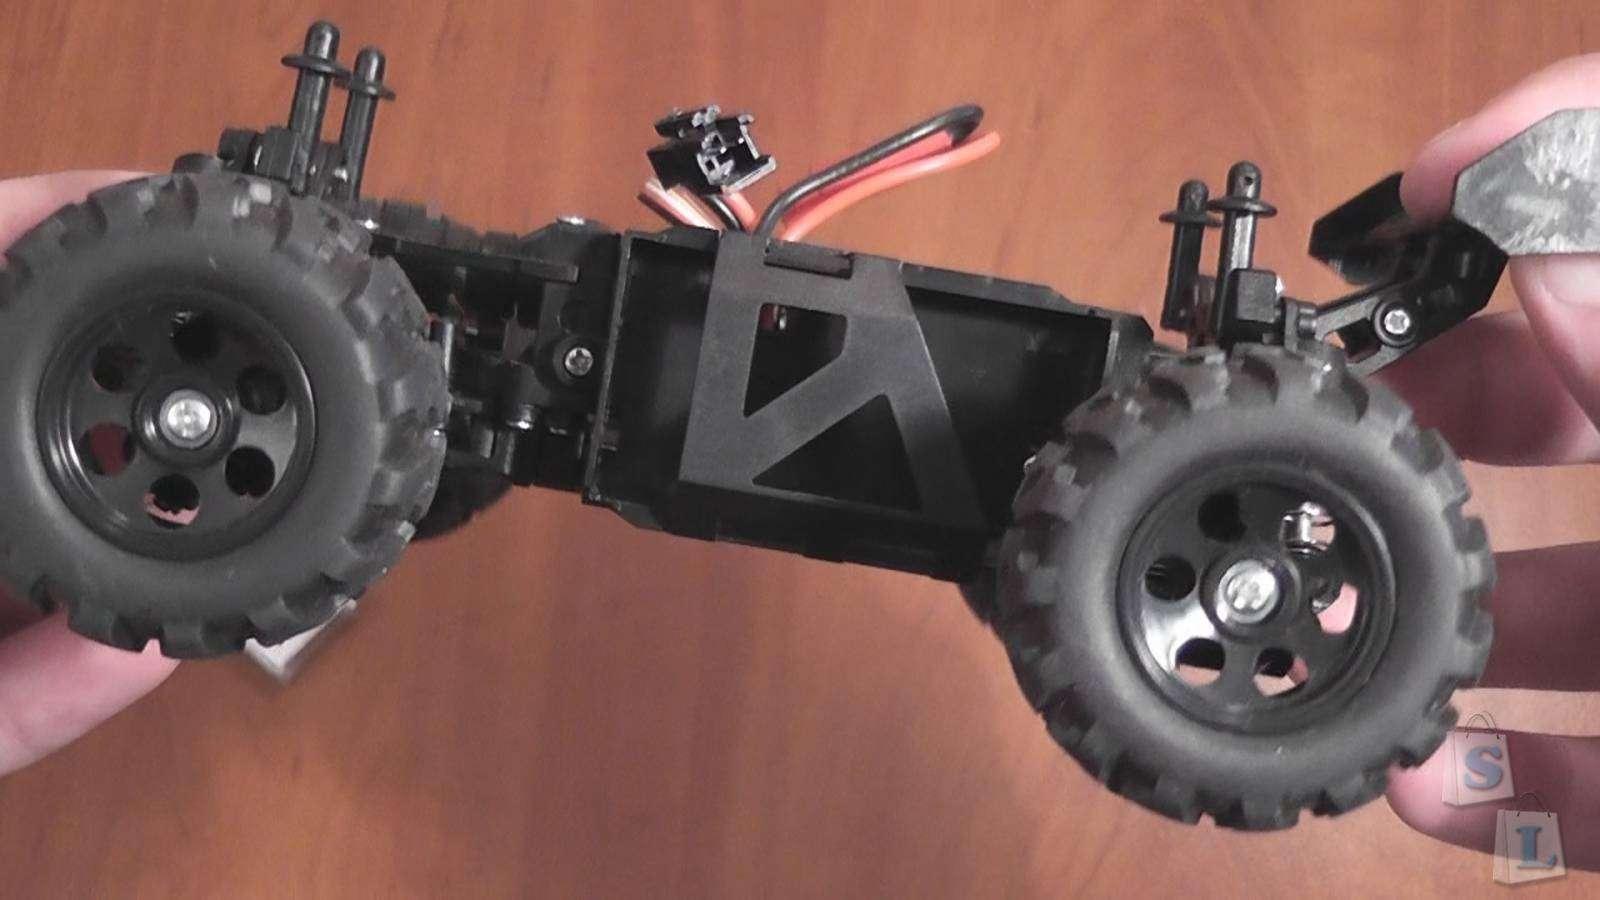 GearBest: KD-summit S600 2.4GHz, 2Ch, 4WD, Mini Truggy car (1:24) (RTR)